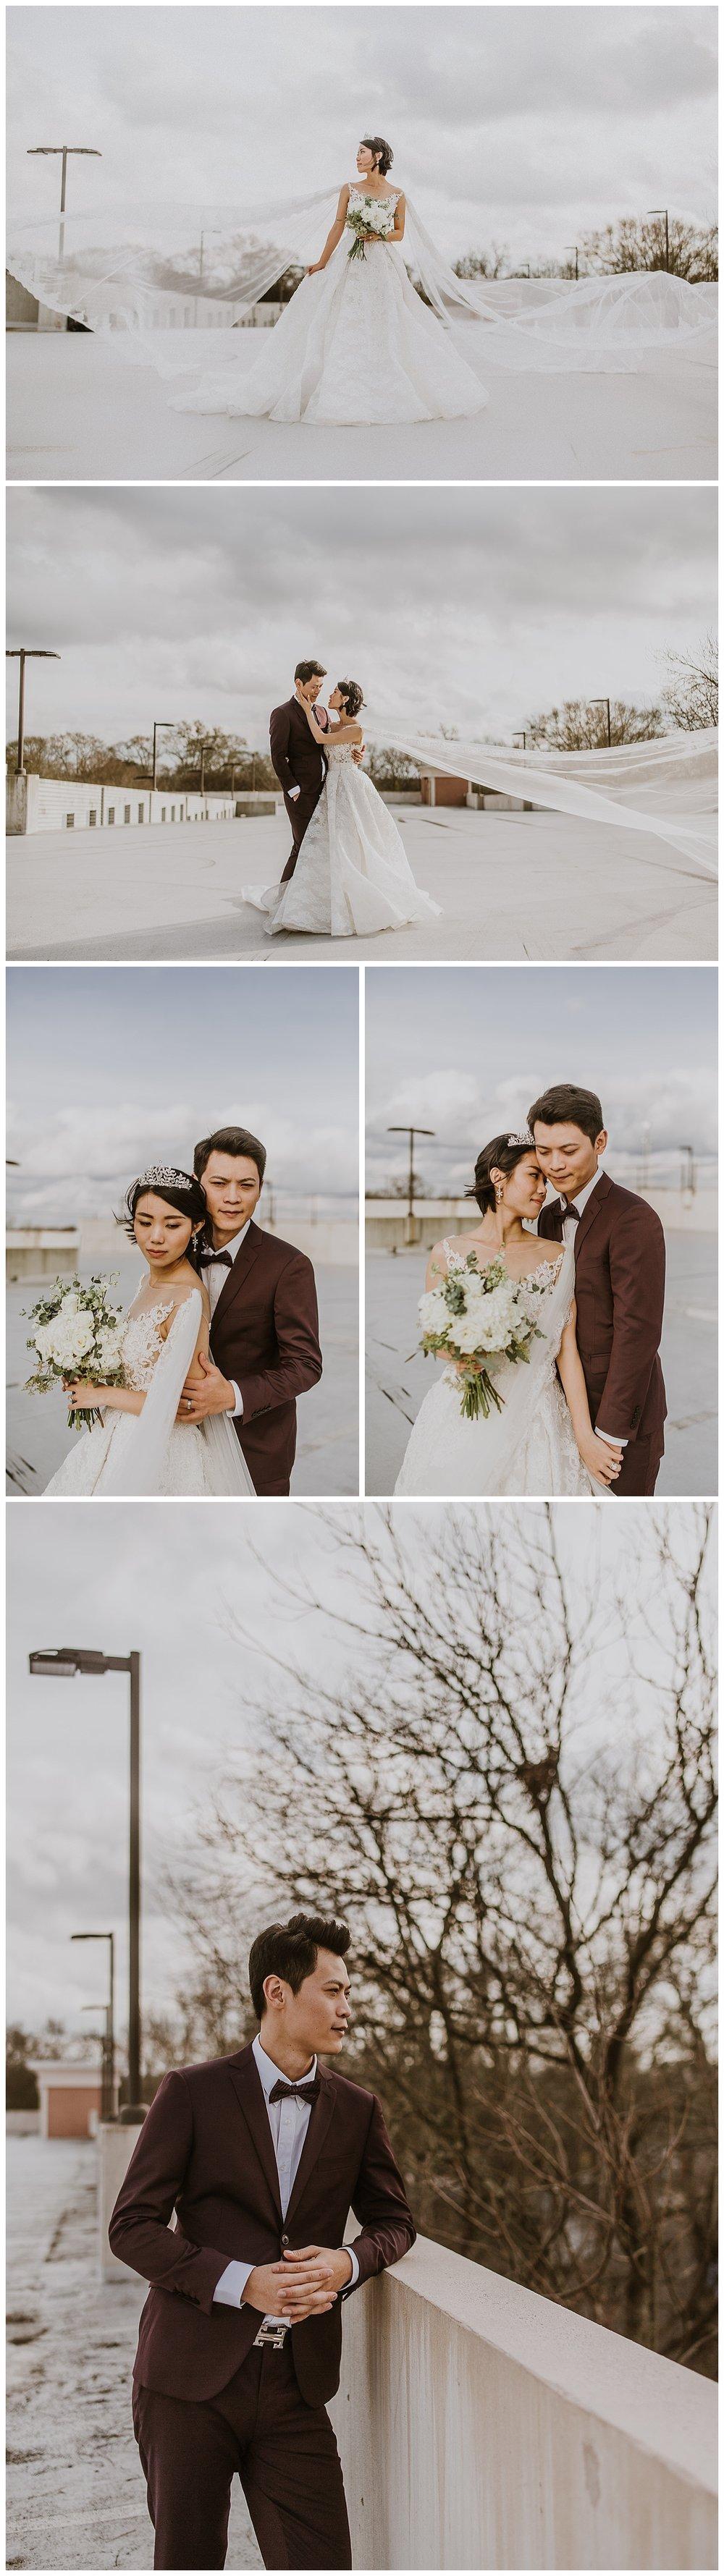 DOUGLASVILLE_GEORGIA_WEDDING_PHOTOGRAPHER_ELOPEMENT_ATLANTA_NATURAL_LIGHT_MOODY_SUNNY_0013.jpg